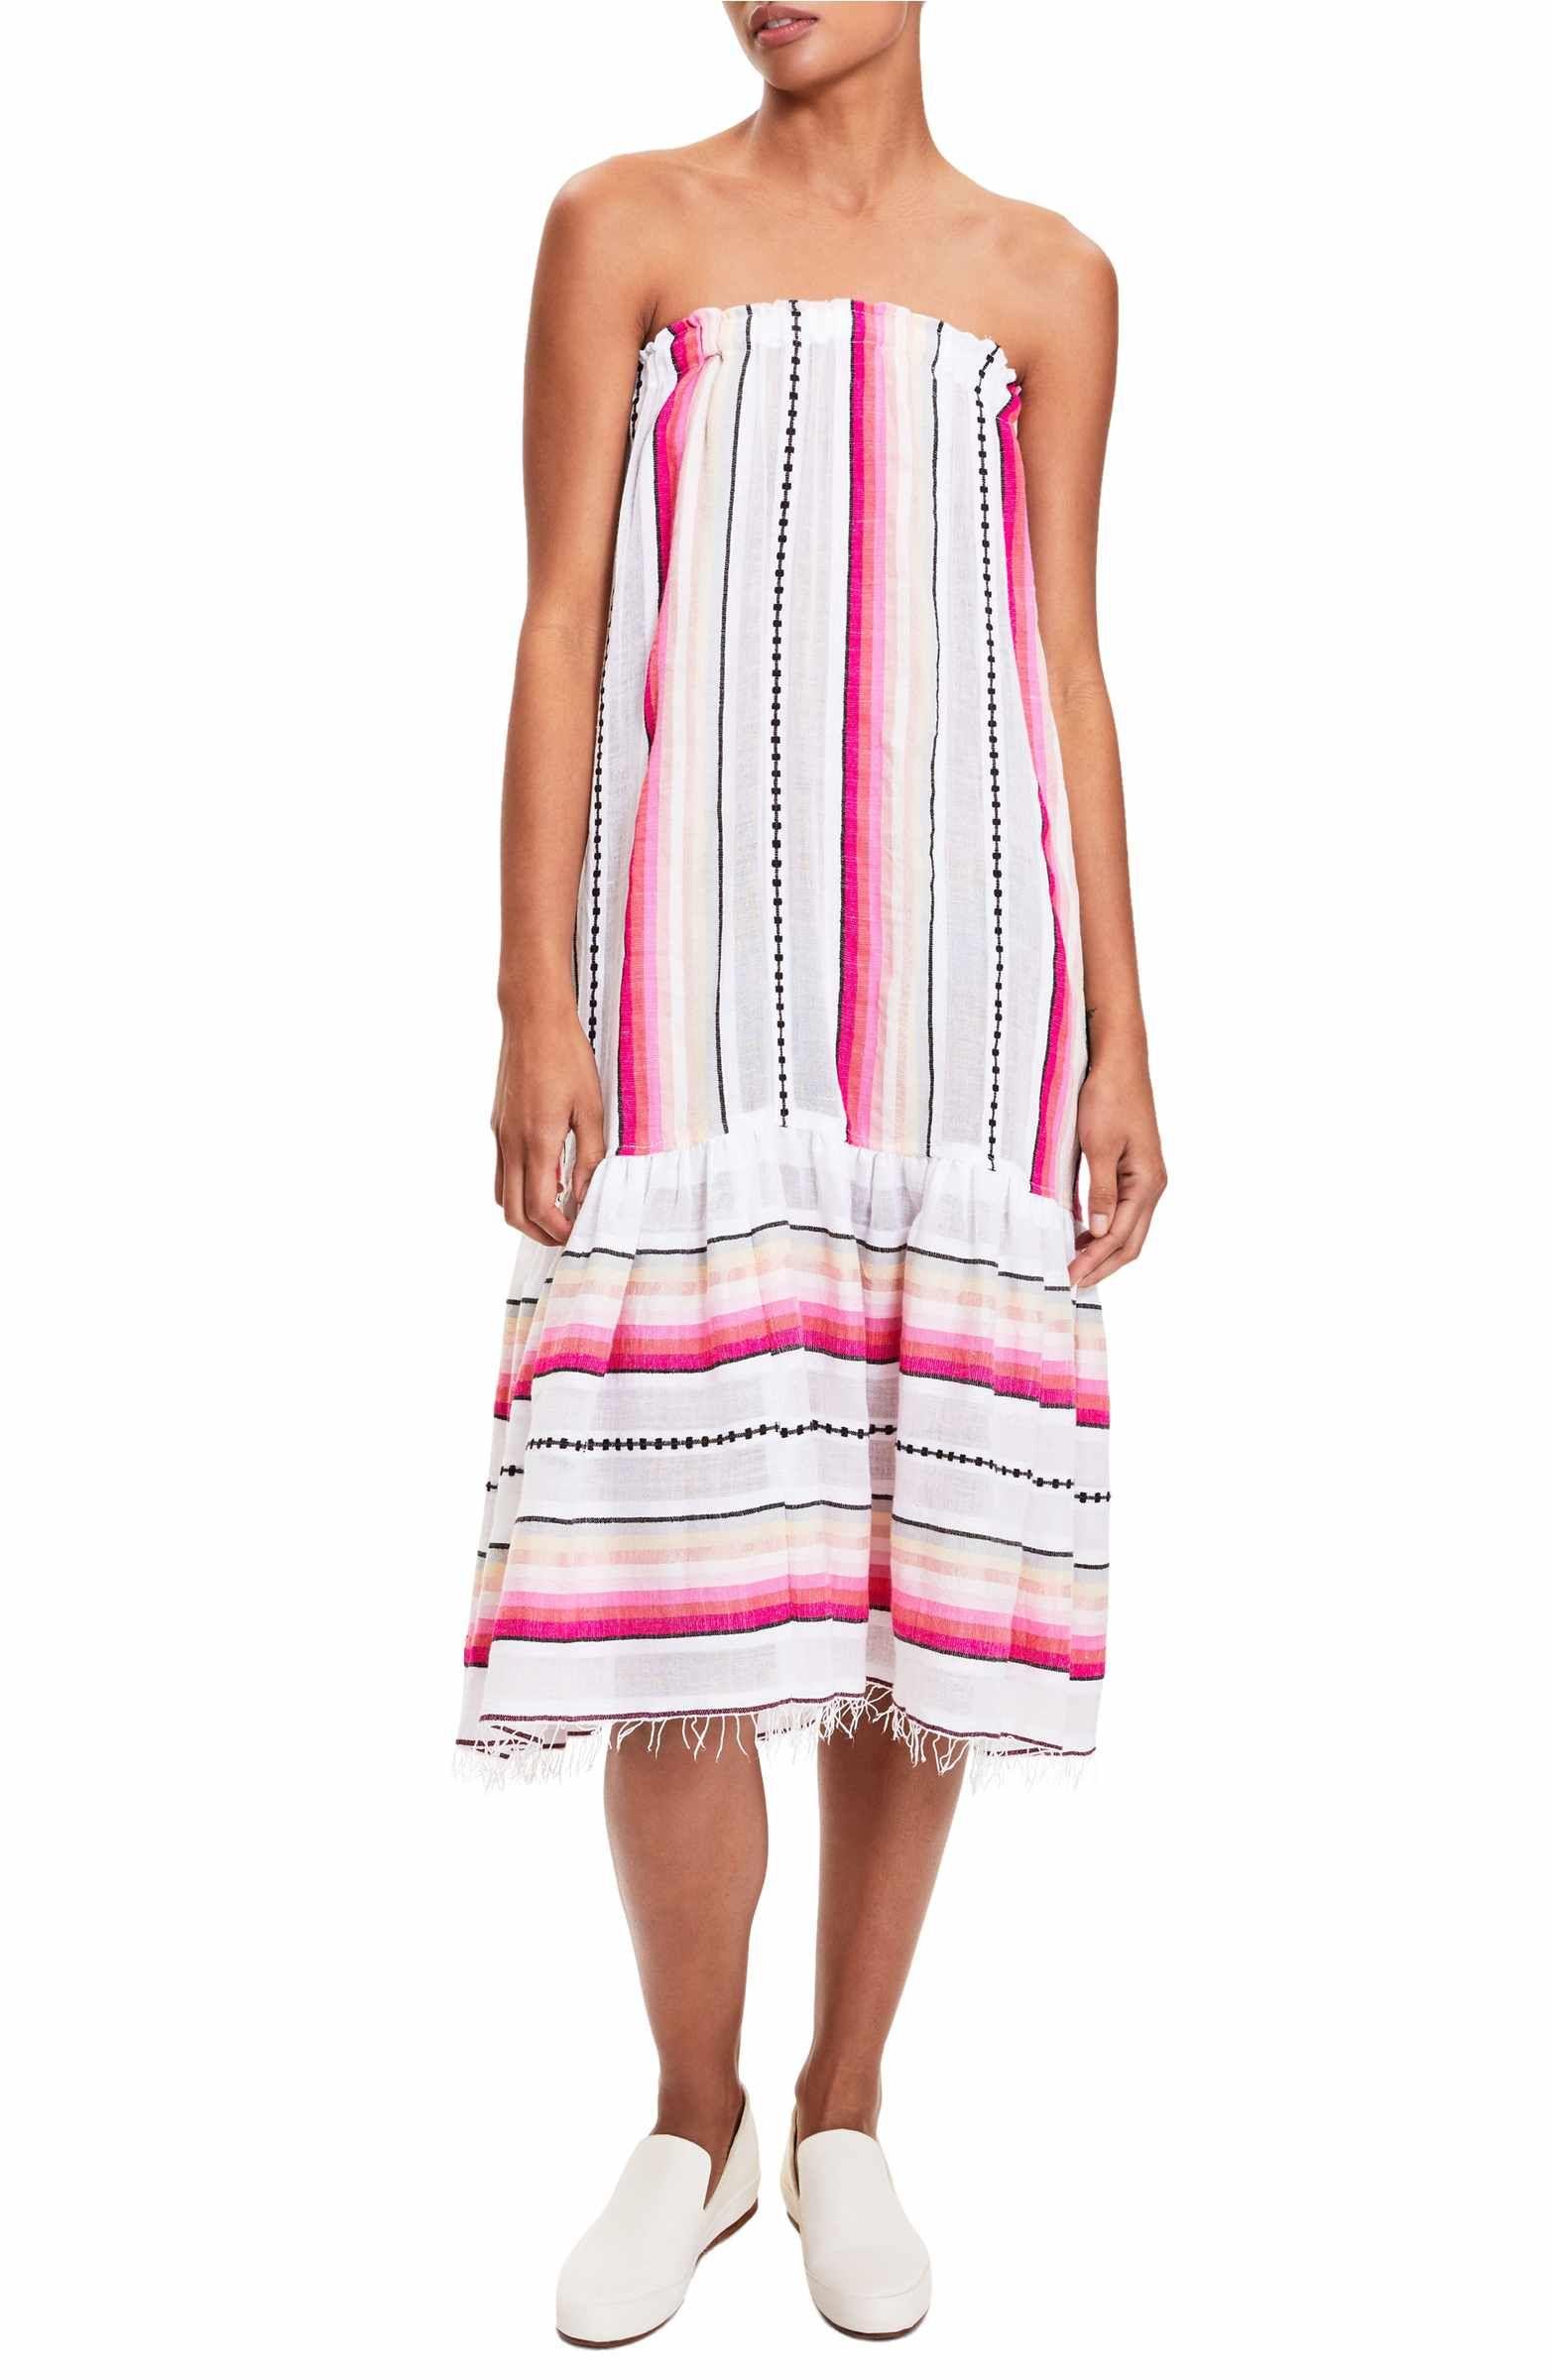 Main Image Lemlem Adia Convertible Cover Up Skirt Strapless Dress